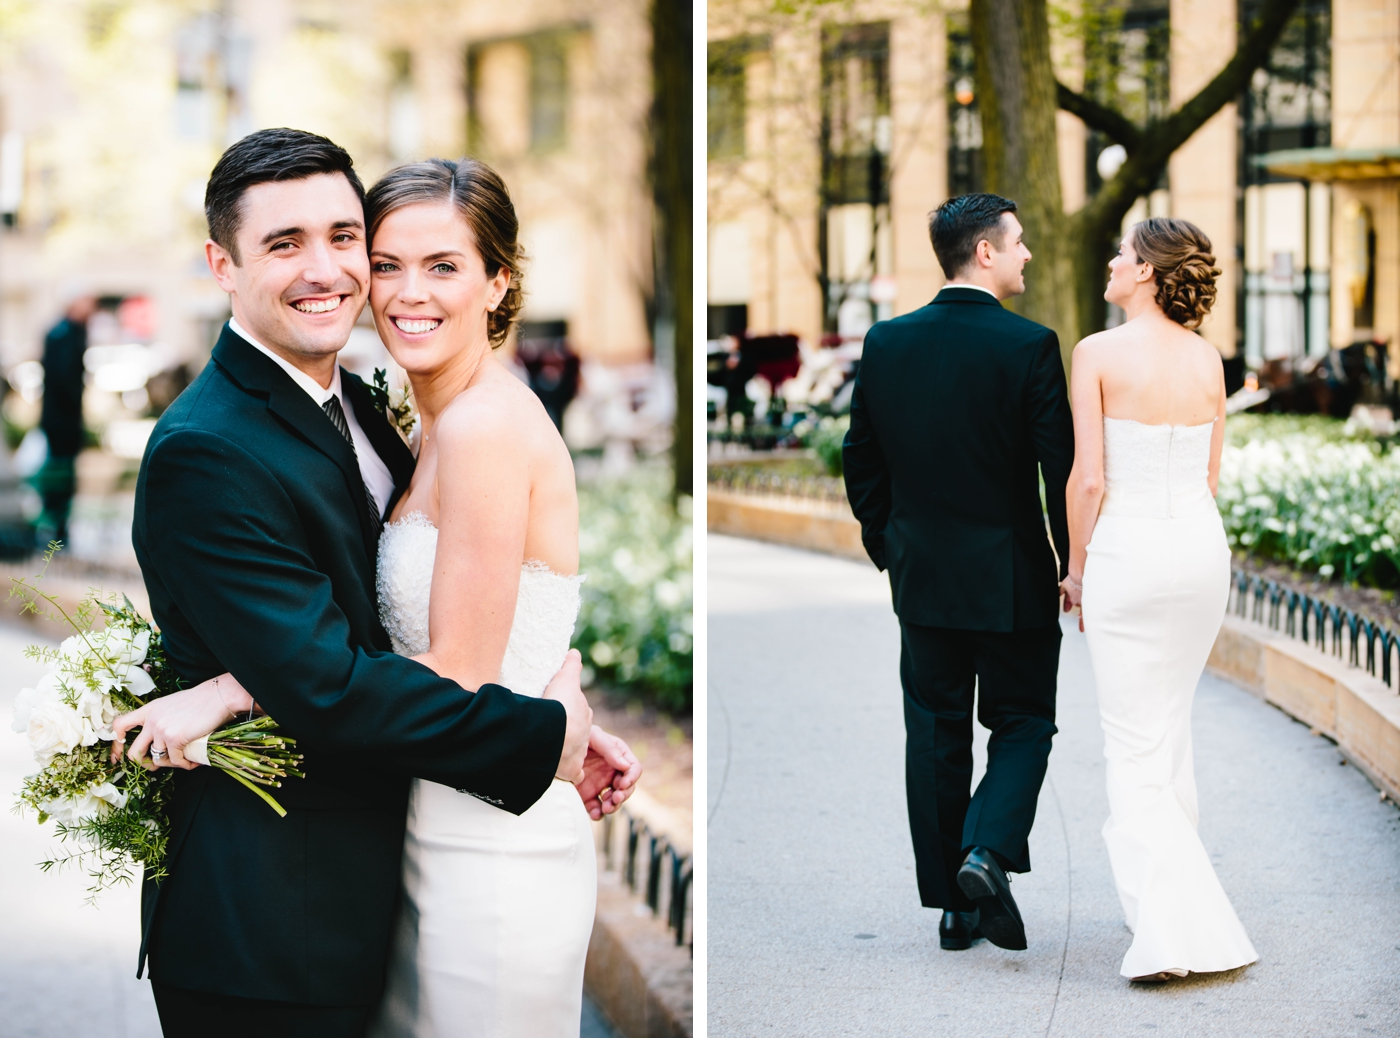 chicago-fine-art-wedding-photography-blais40